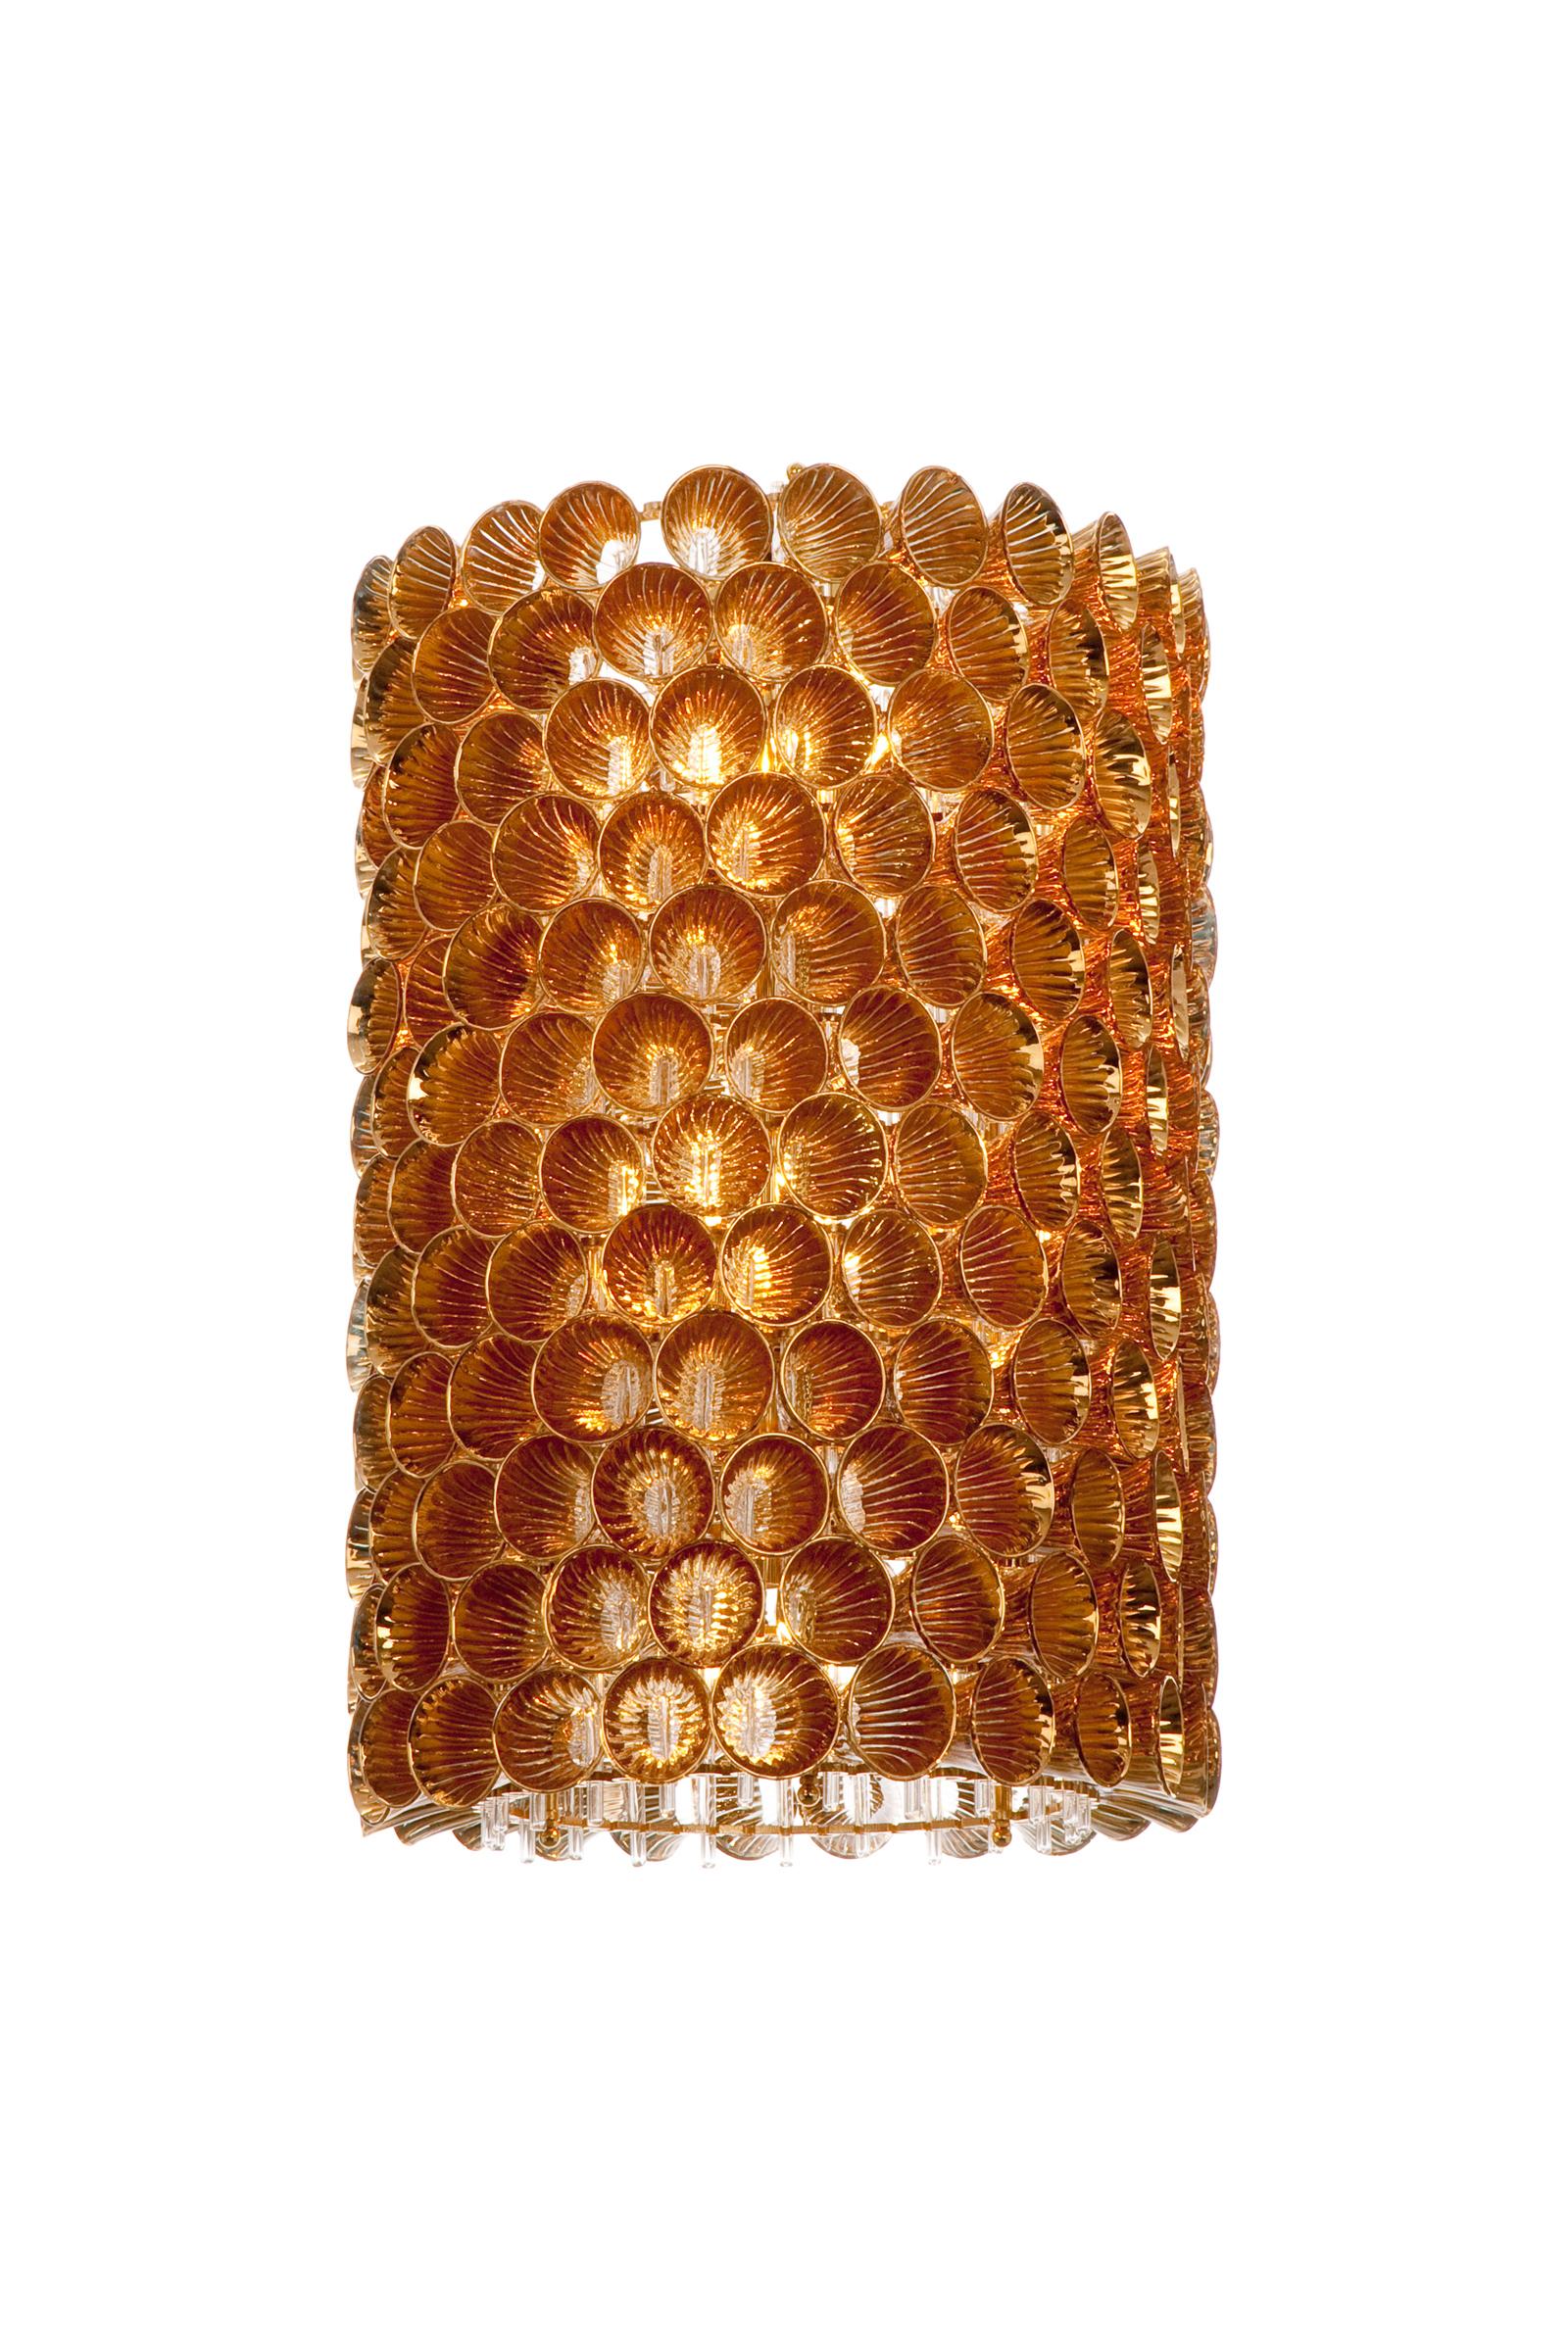 corail-suspension-gold-veronese-gmaurizio-galante-tal-lancman-11.jpg